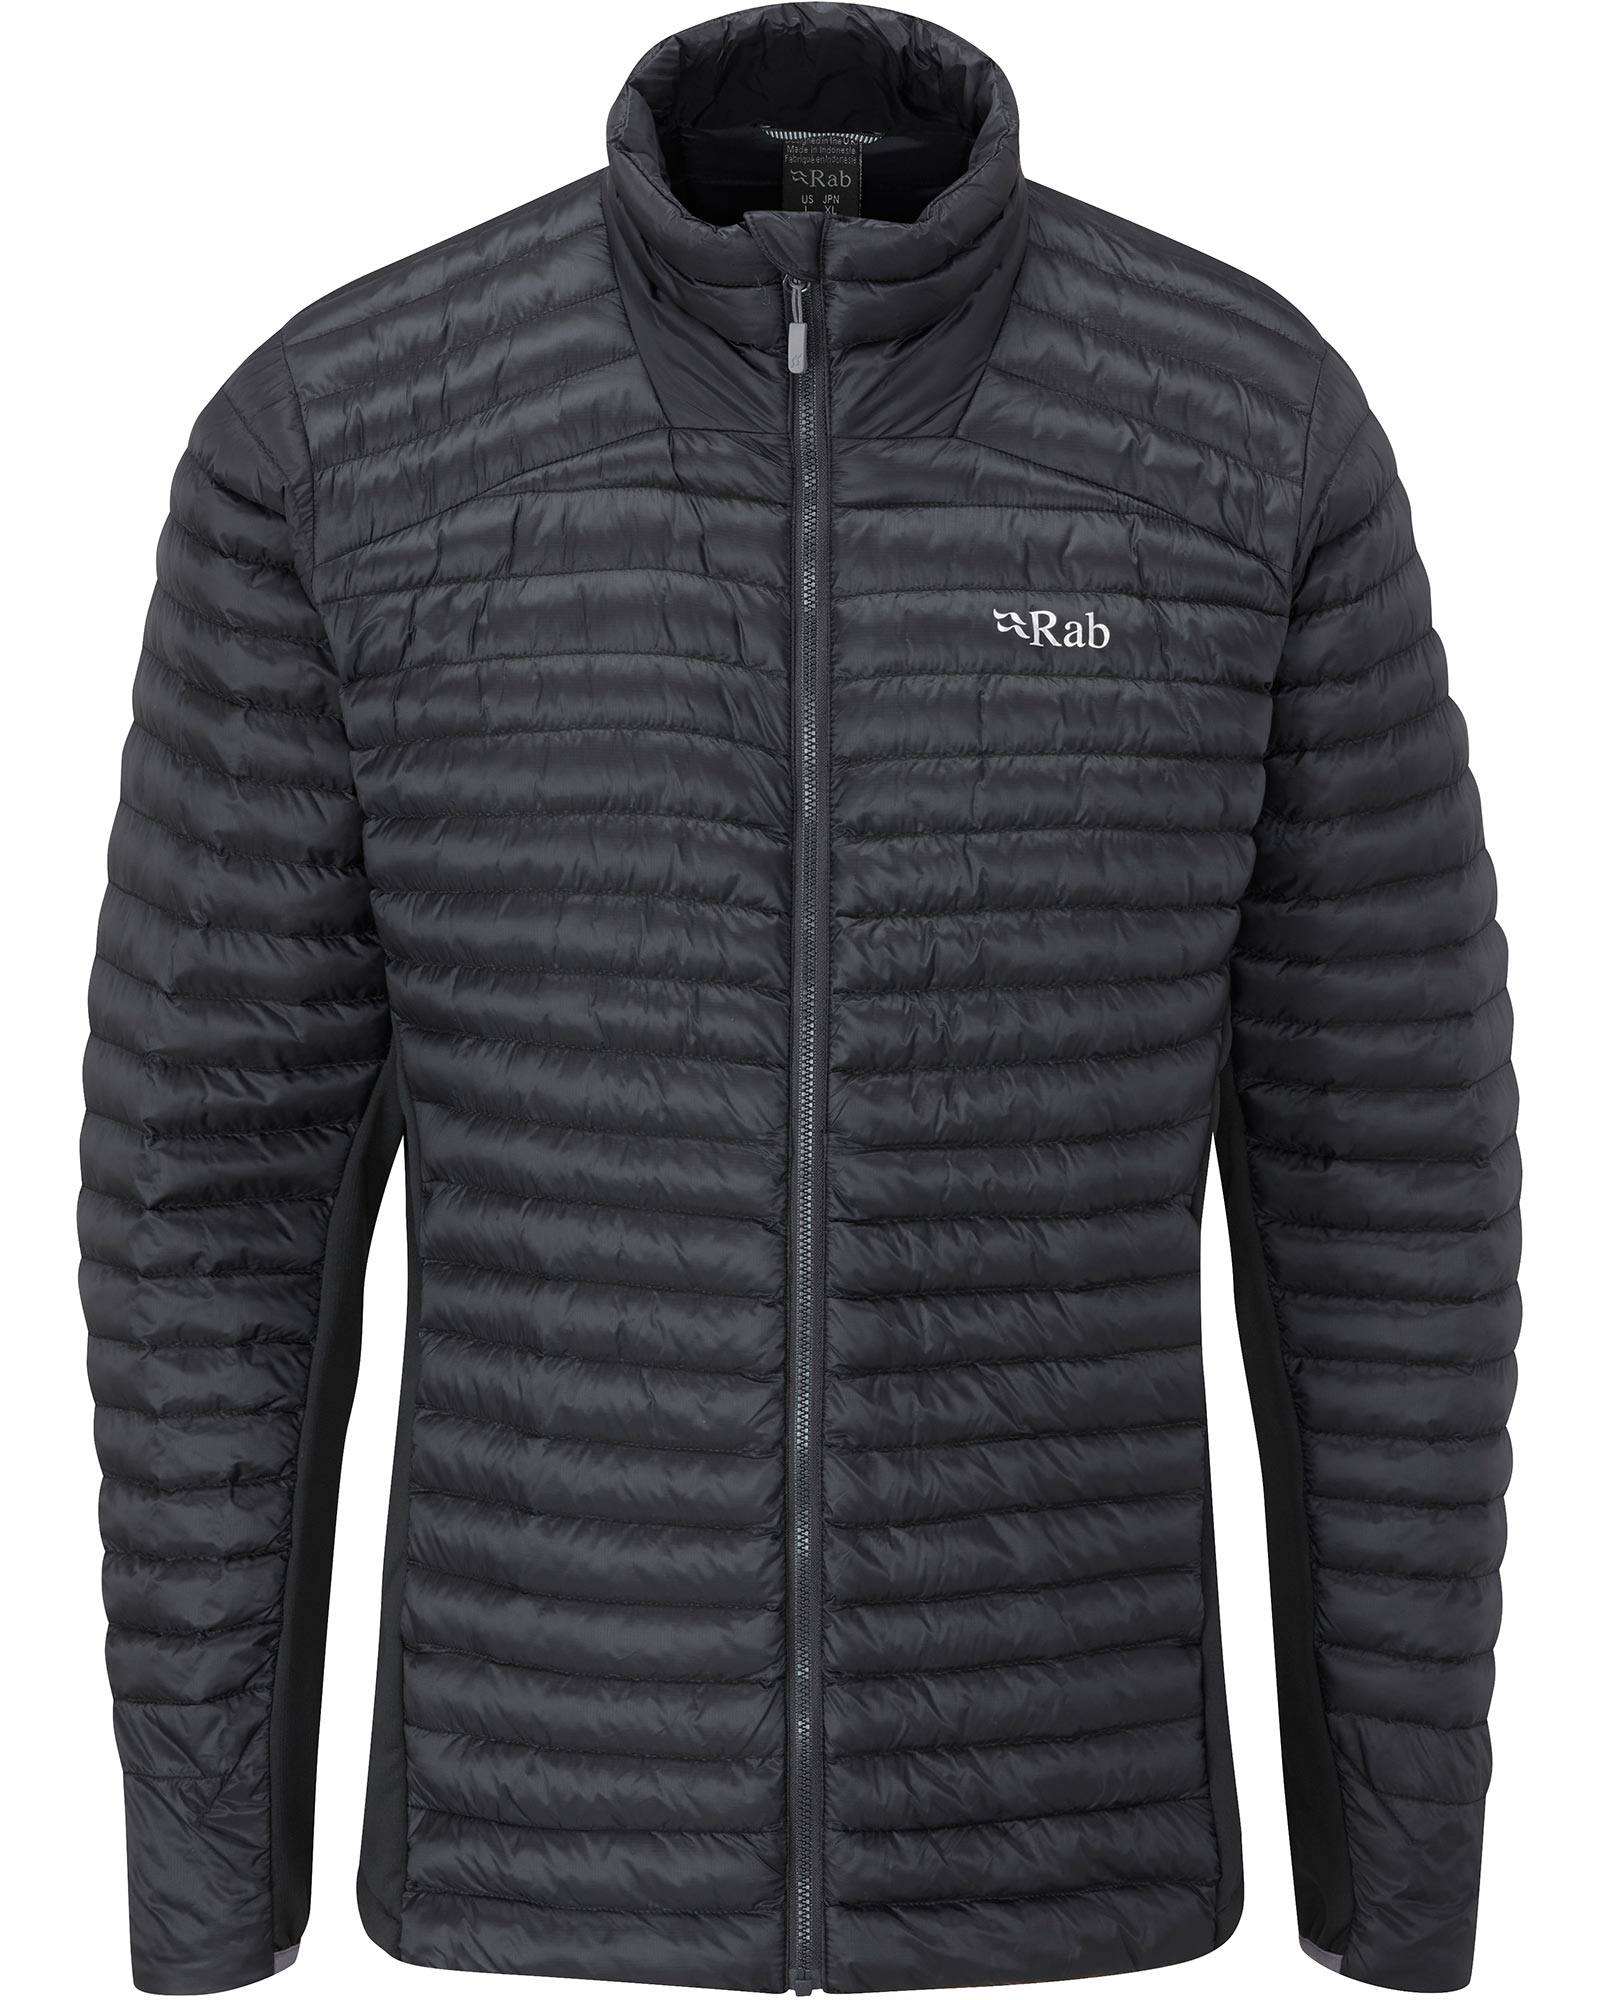 Rab Cirrus Flex 2.0 Men's Jacket 0